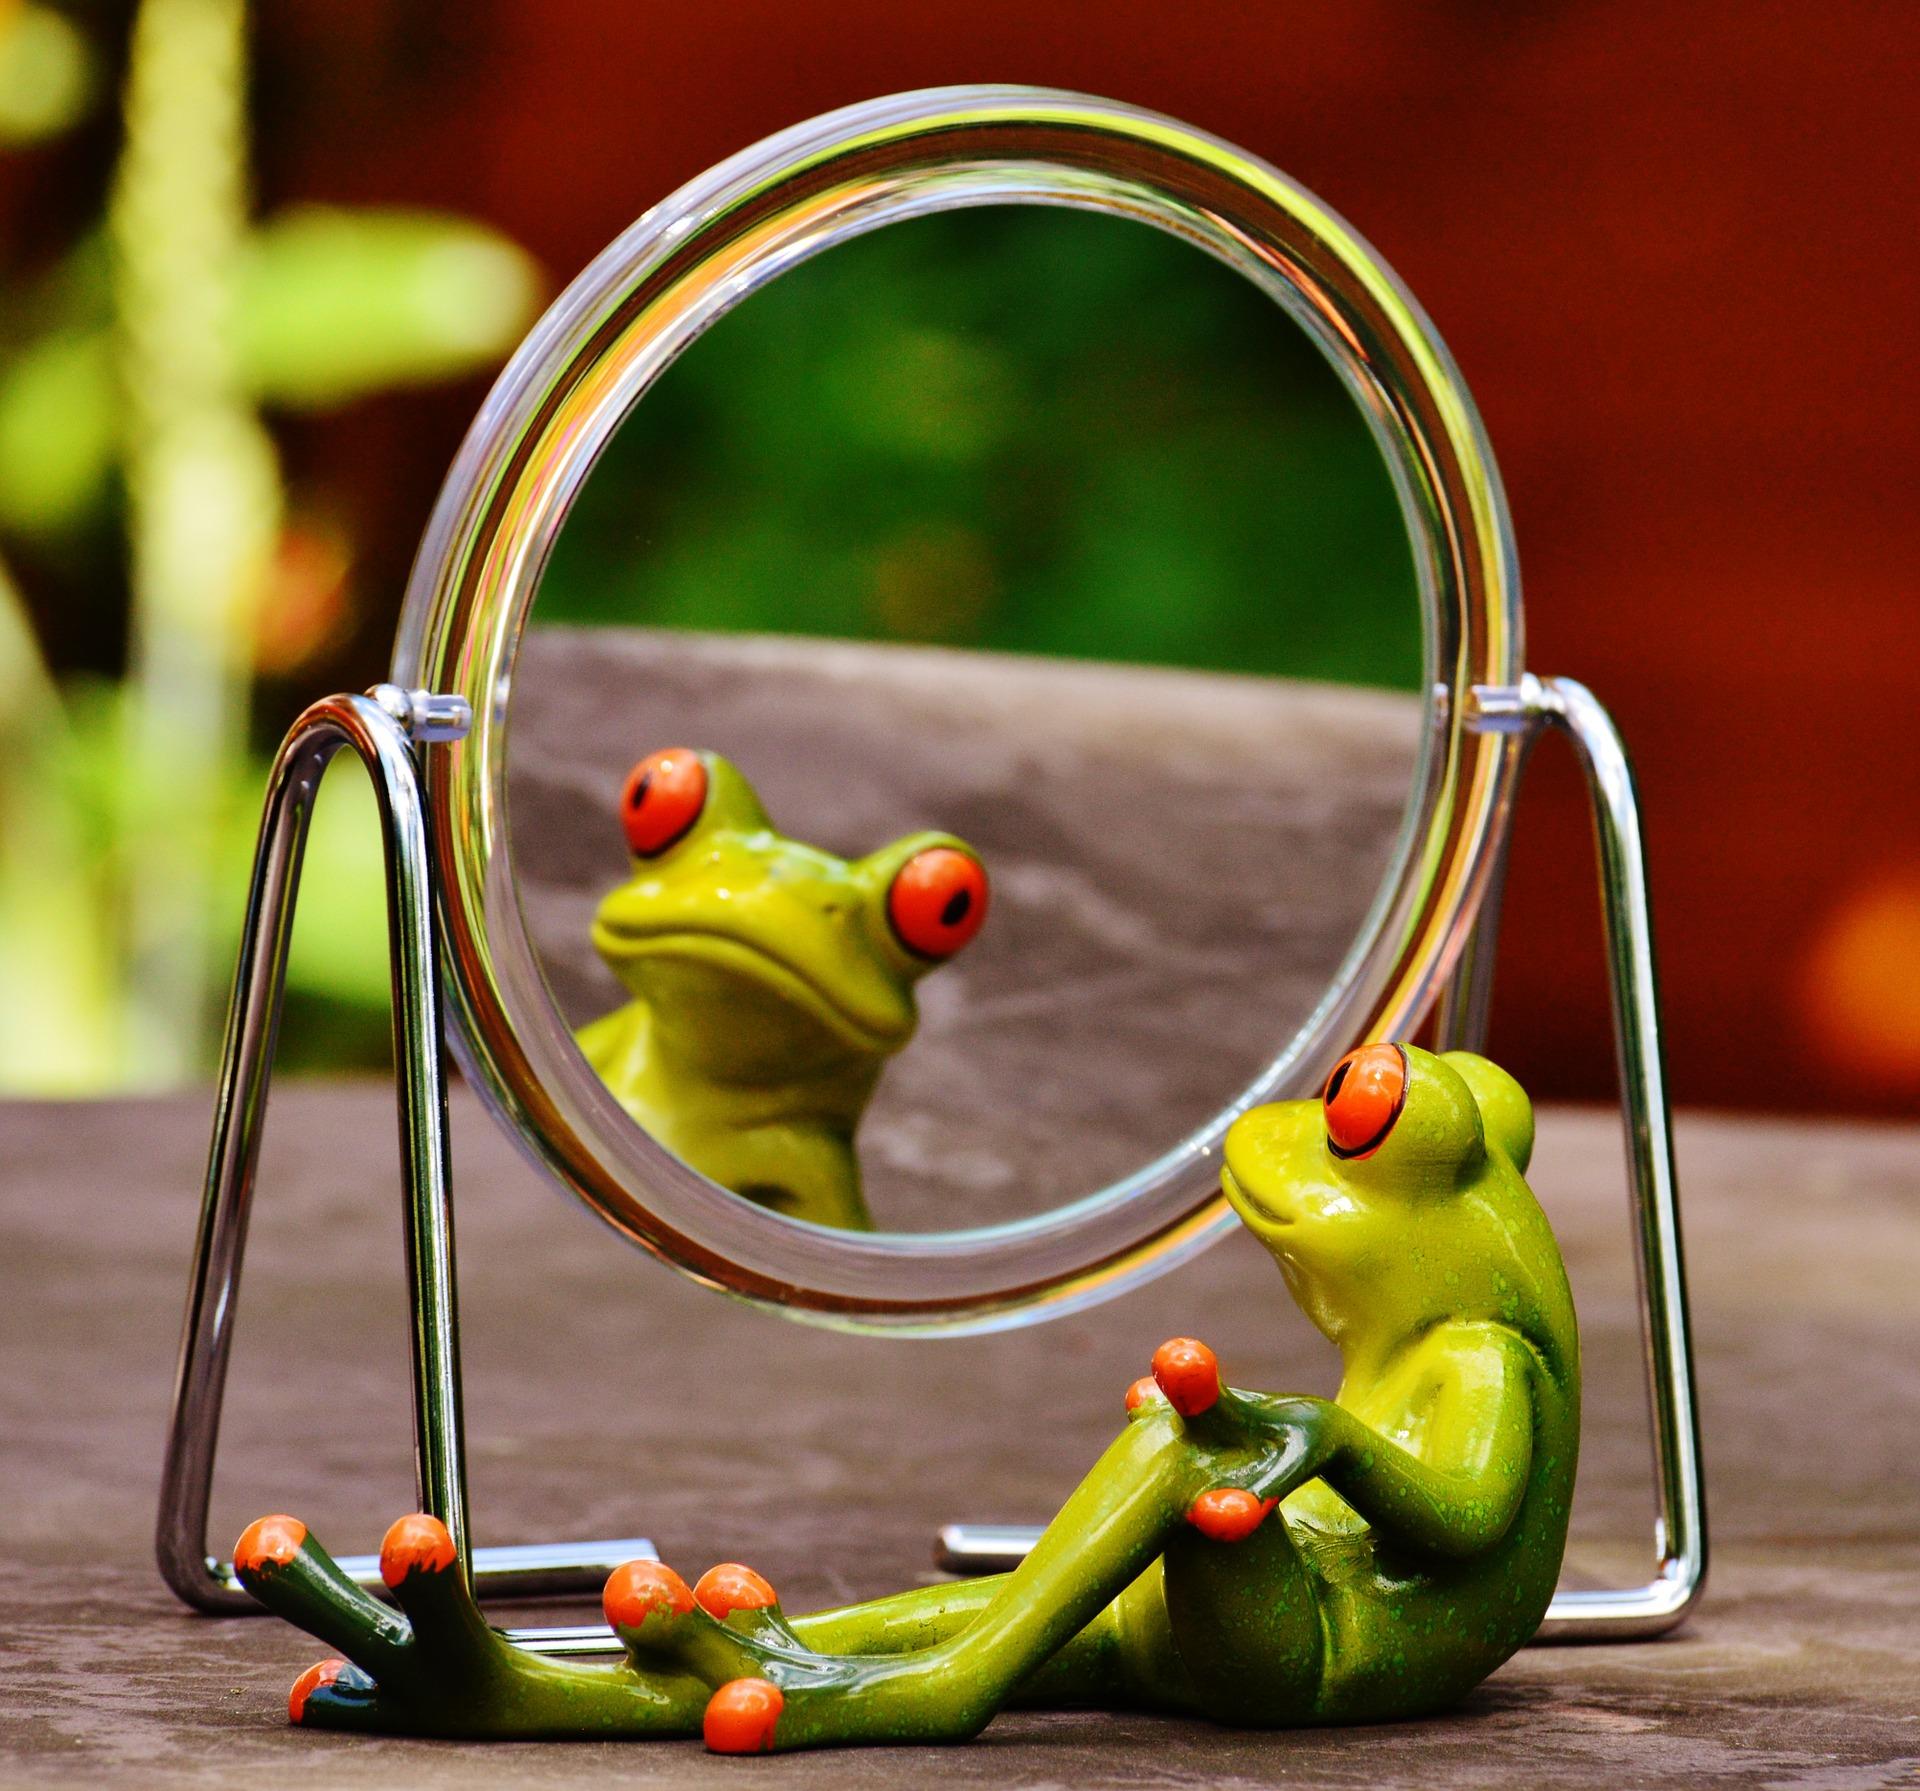 frog-1498909_1920.jpg